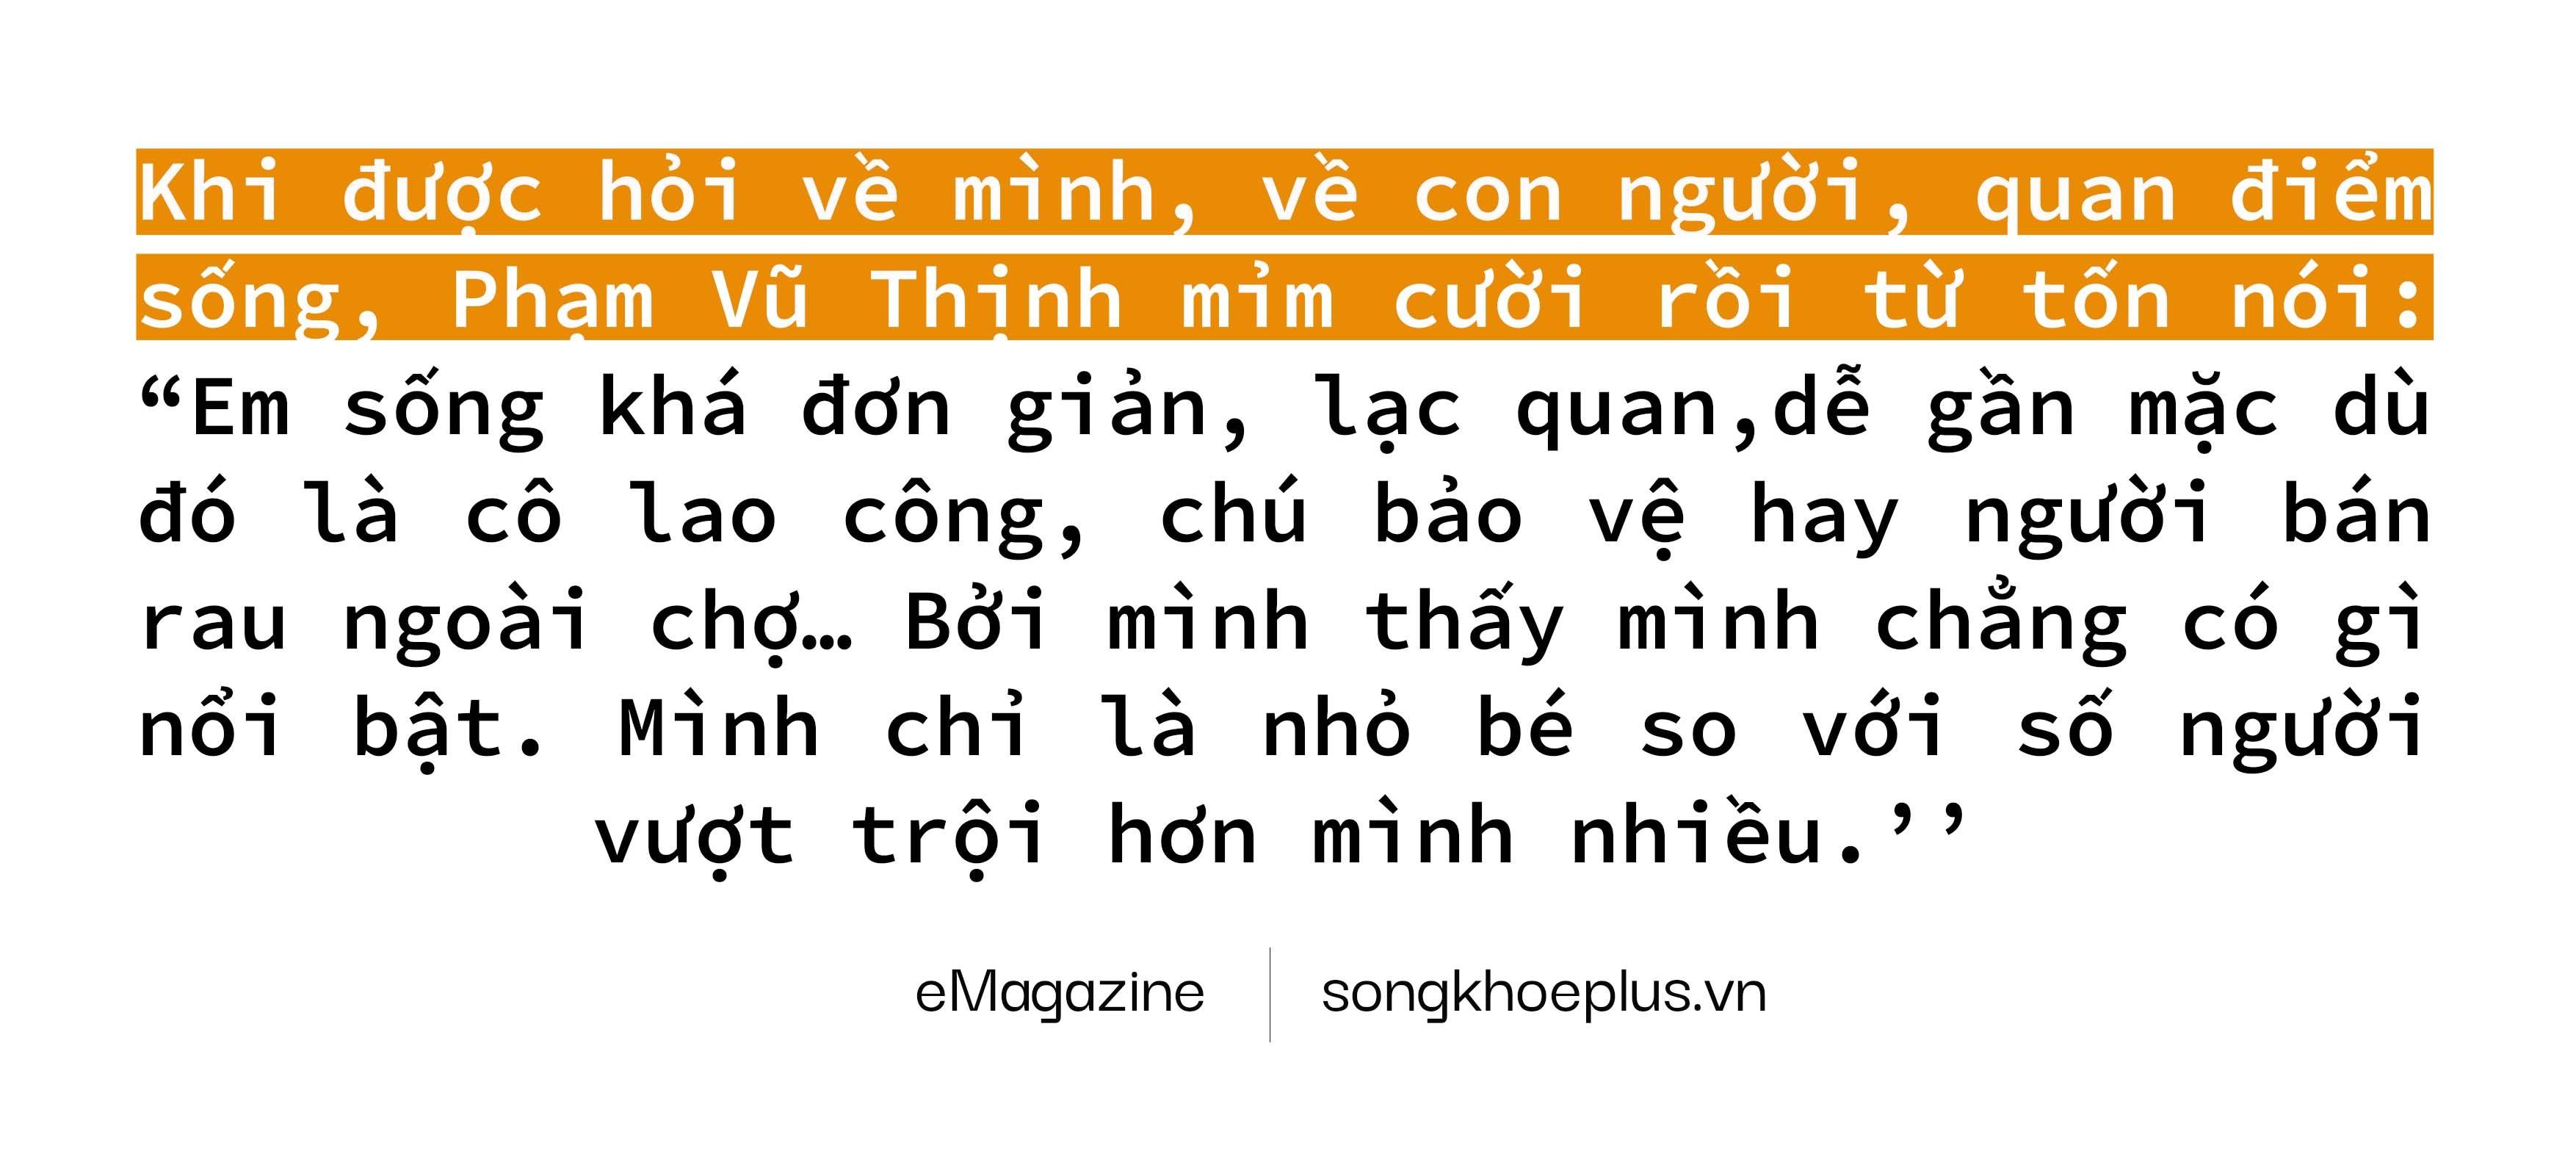 sapo-pham-vu-thinh-songkhoeplus-1621040511.jpg